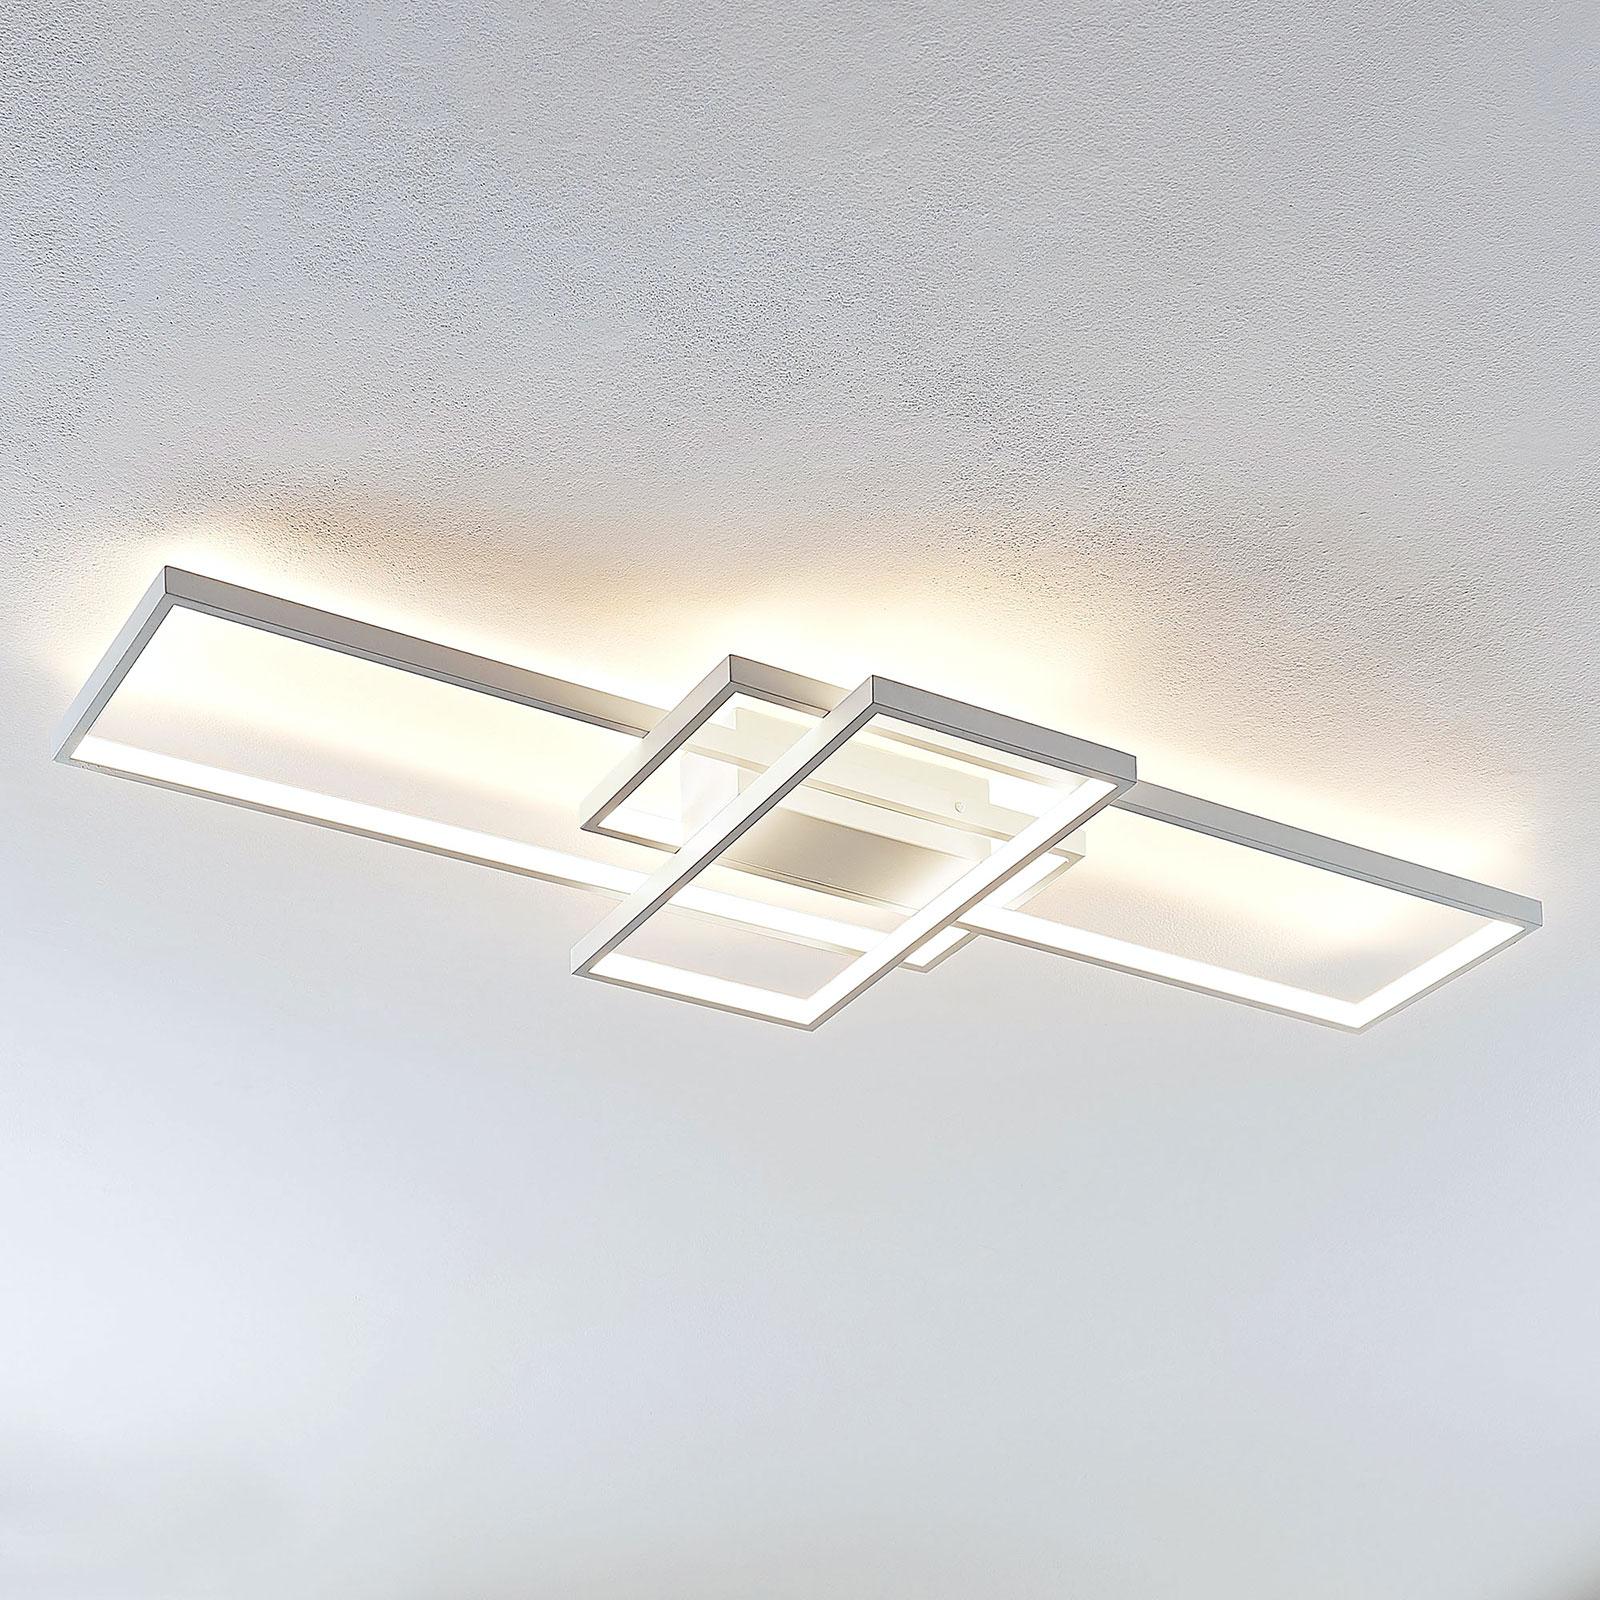 Lindby Poppy LED plafondlamp met dimfunctie